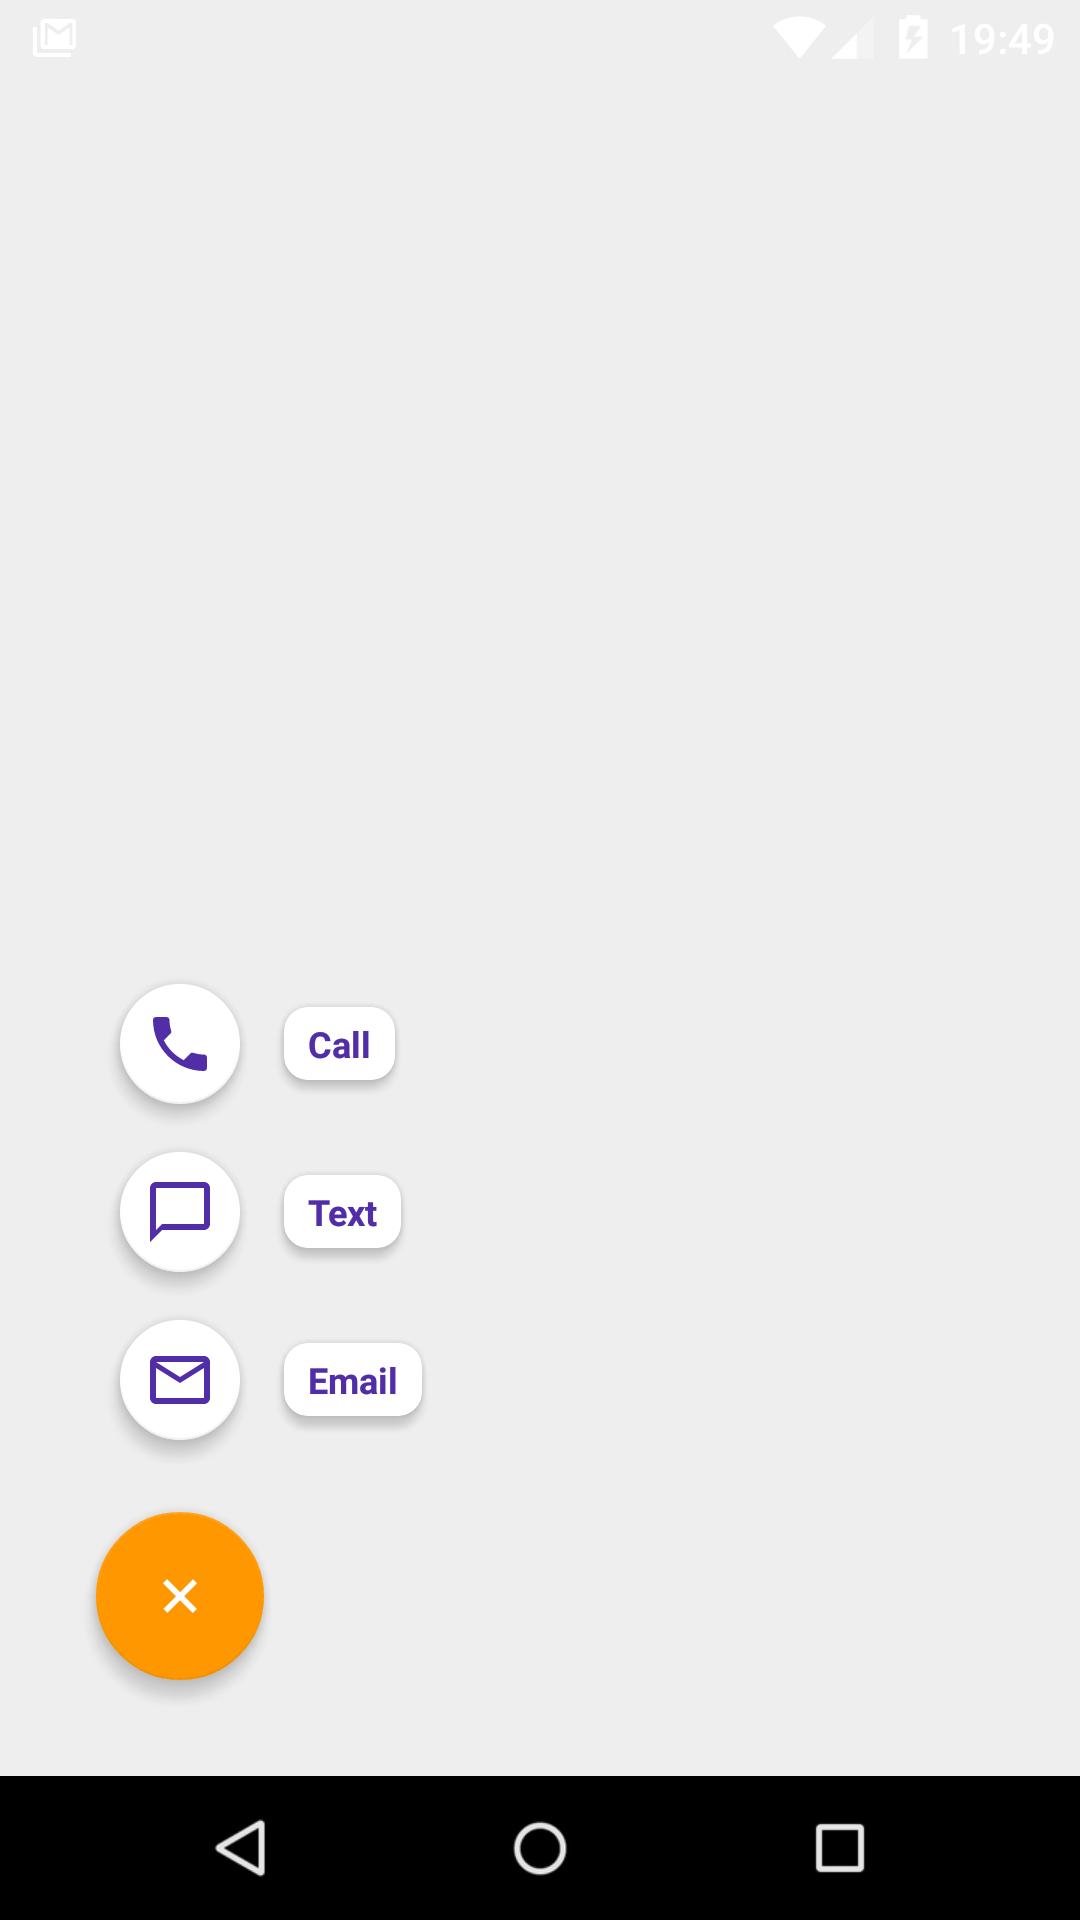 GitHub - yavski/fab-speed-dial: FAB flinging out actionable menu